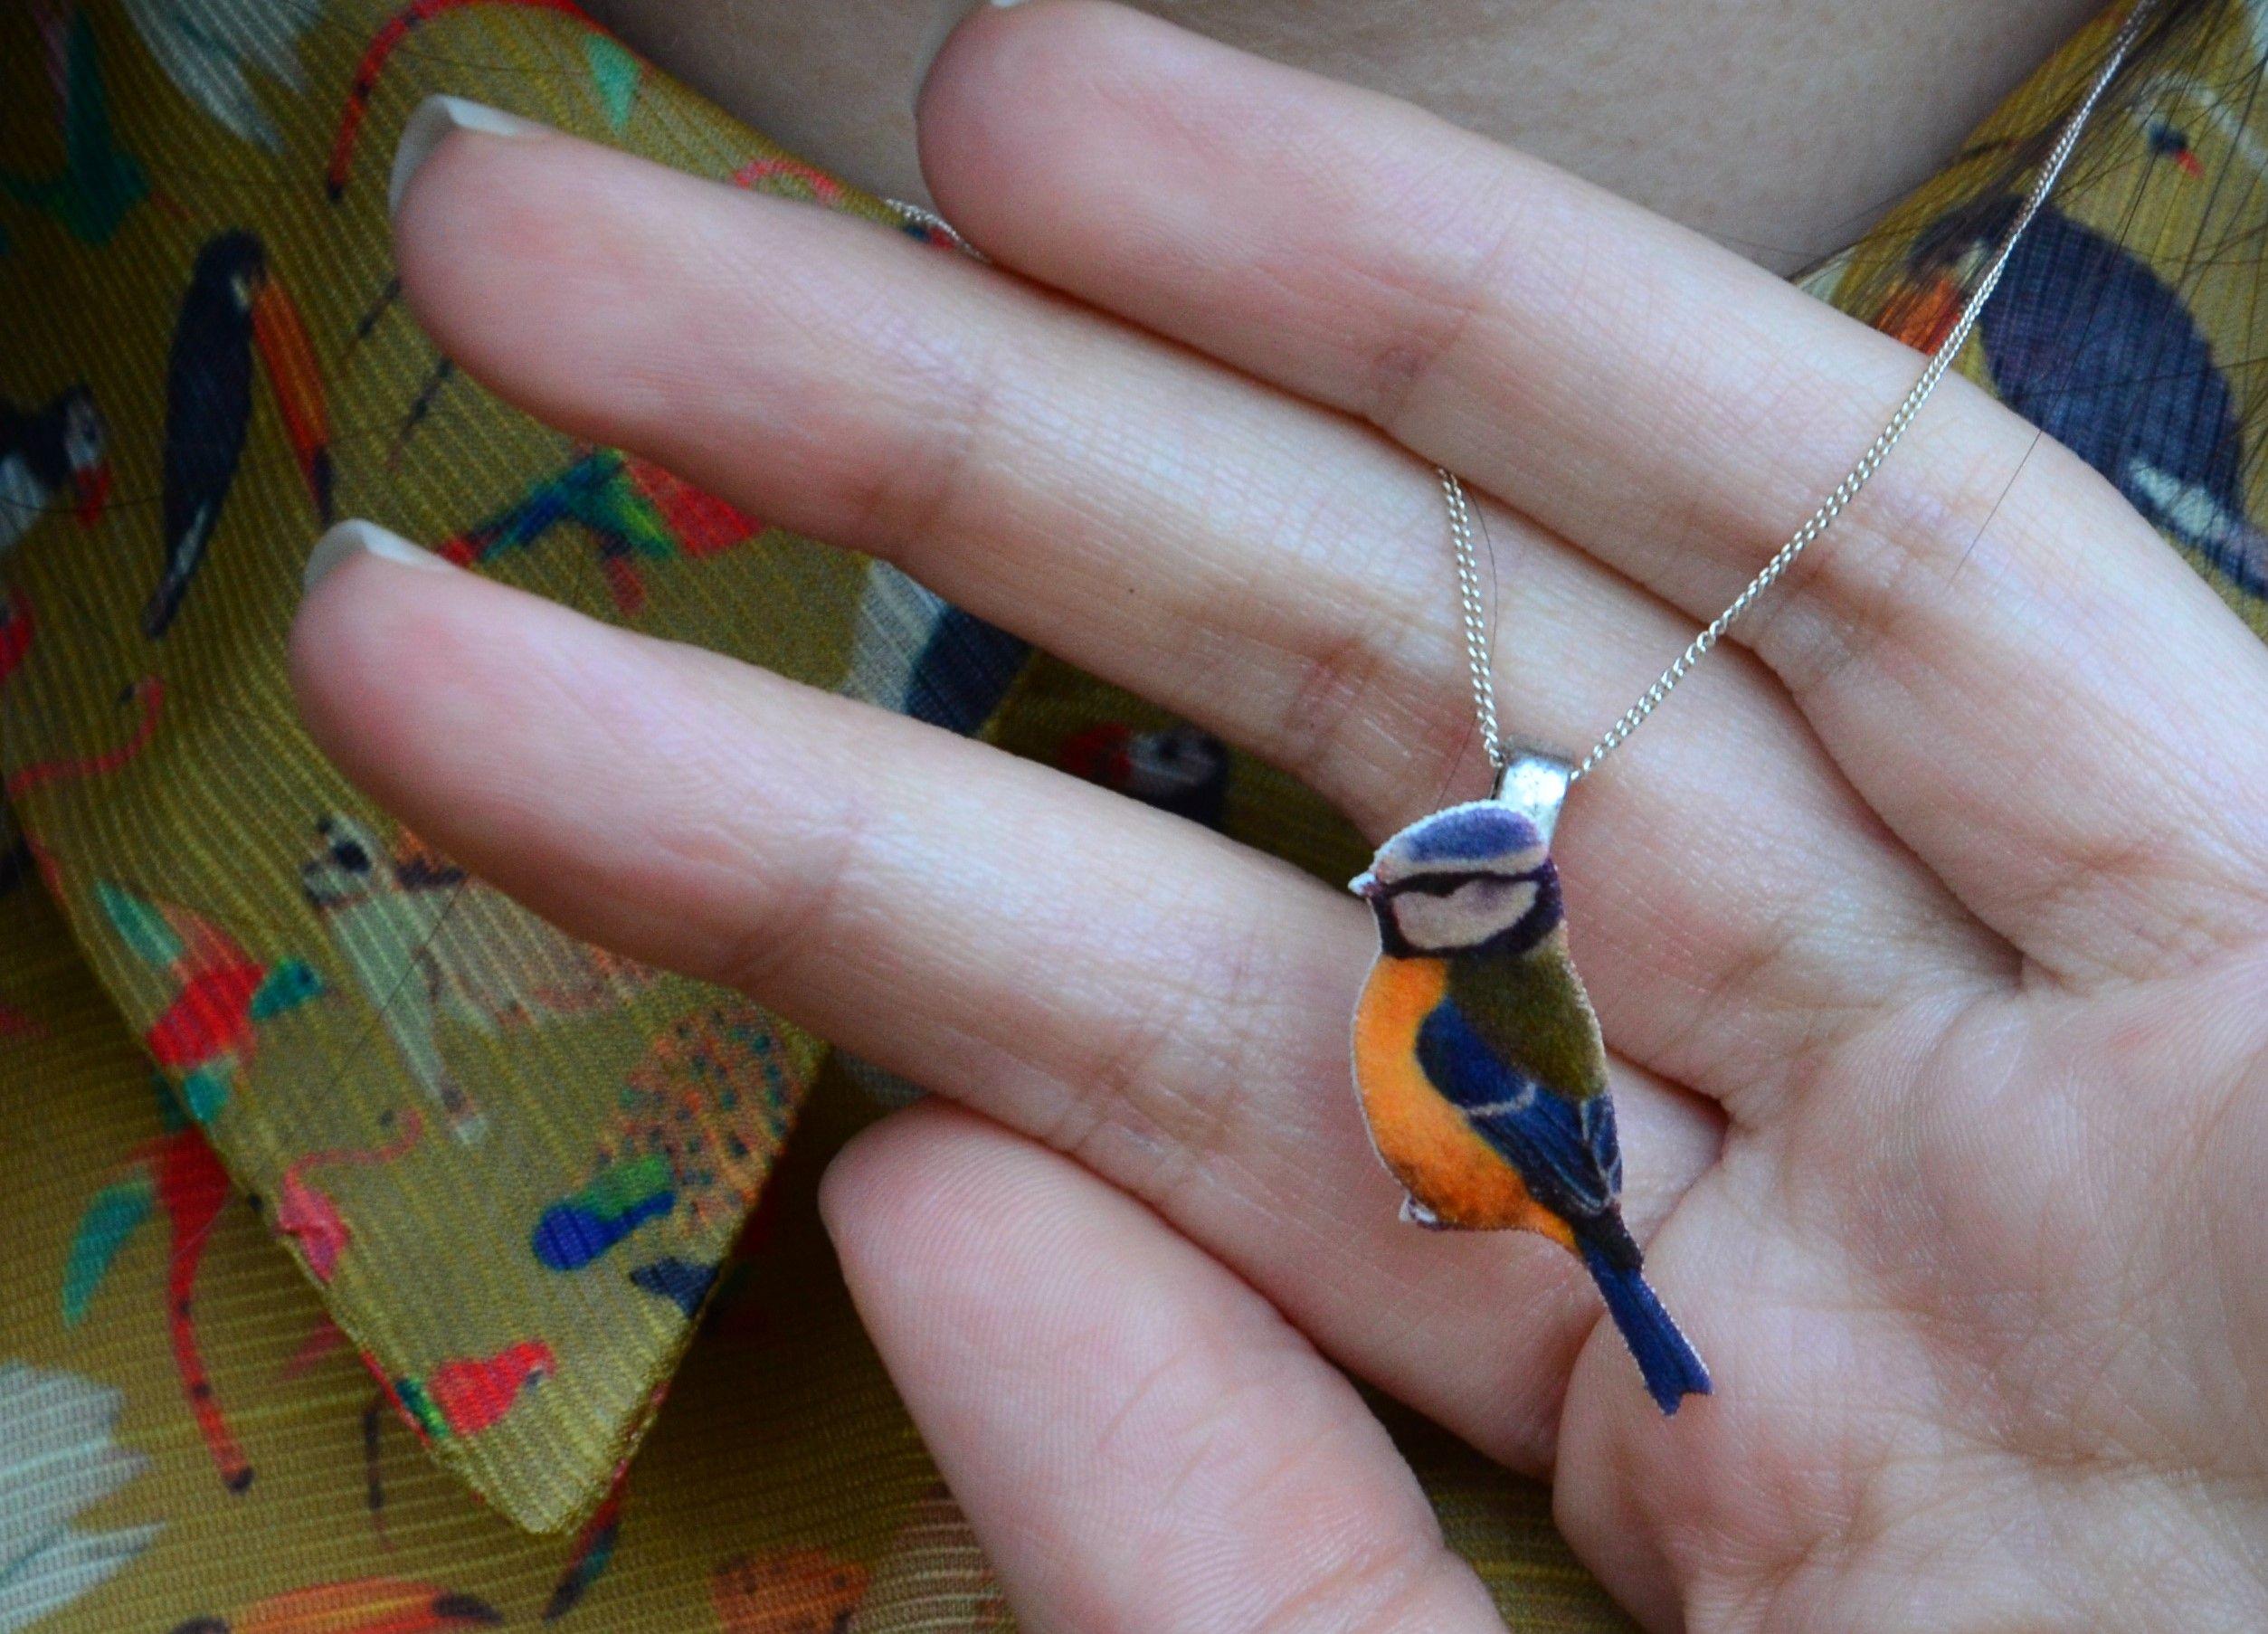 Necklace: https://www.etsy.com/listing/473634720/blue-tit-sterling-silver-925-fine-detail?ref=shop_home_active_59